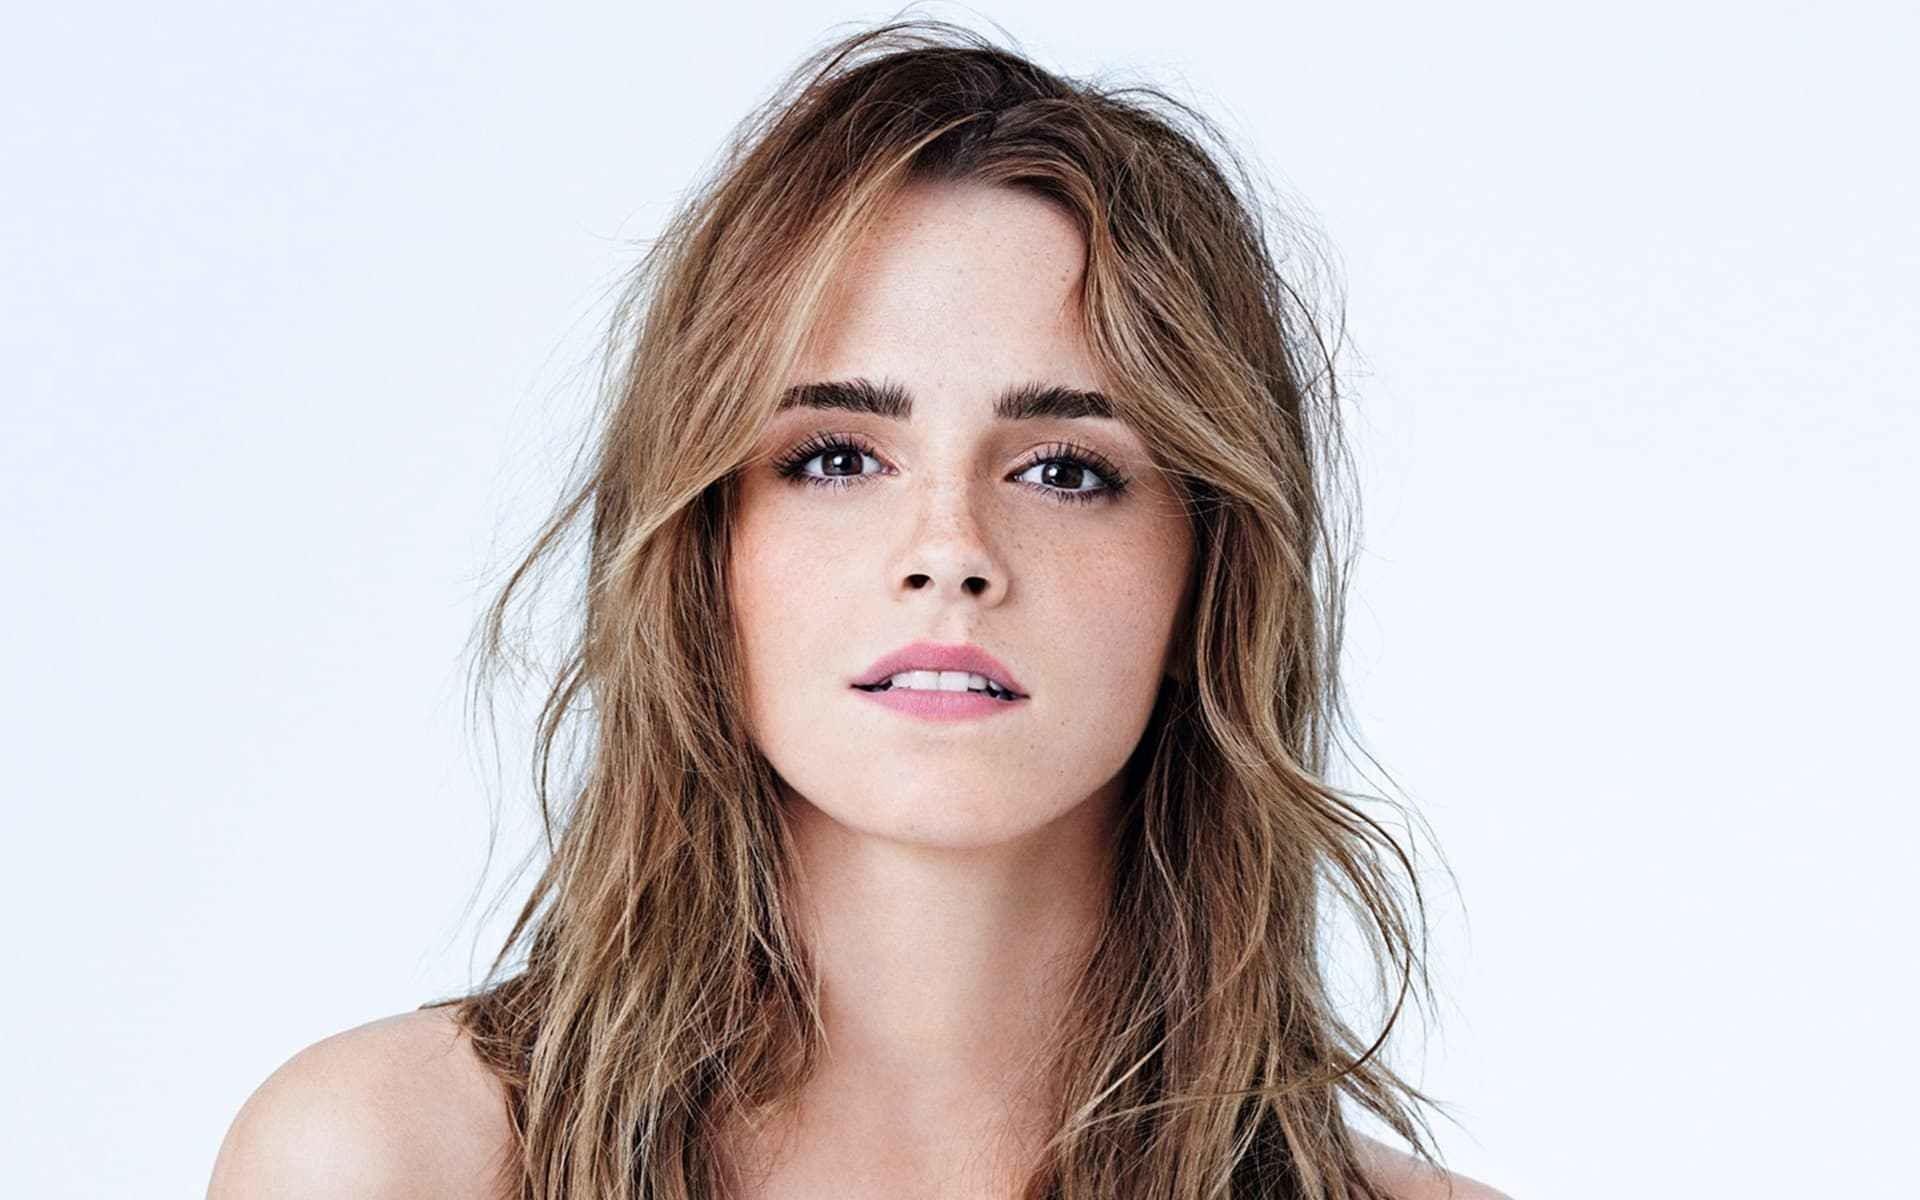 Emma watson iphone wallpaper tumblr – Emma Watson Hd Wallpapers 8